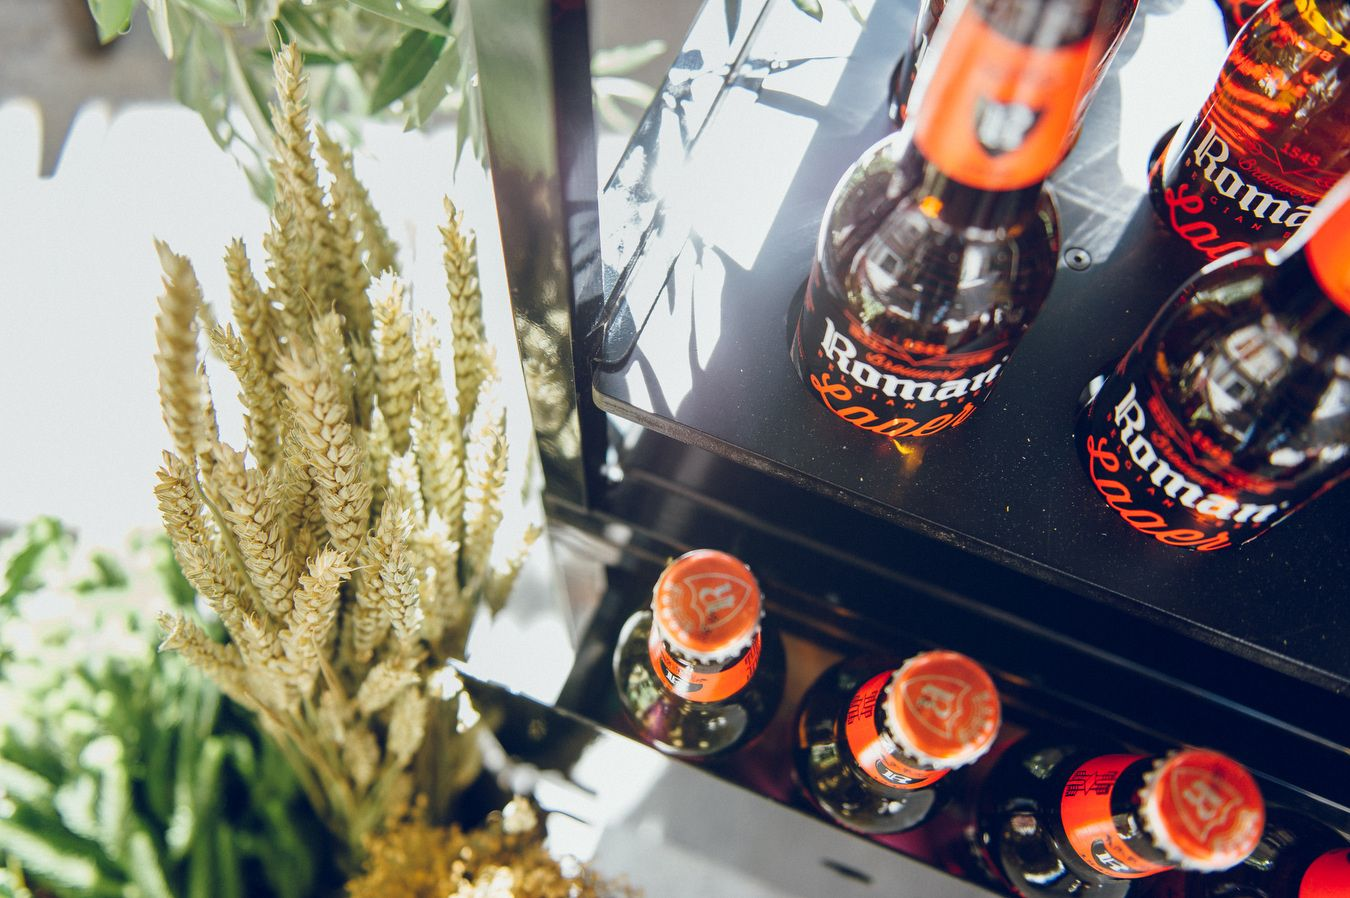 calista-one-lista-de-bodas-online-blog-de-bodas-calista-one-summer-party-2016-roman-cervezas-6